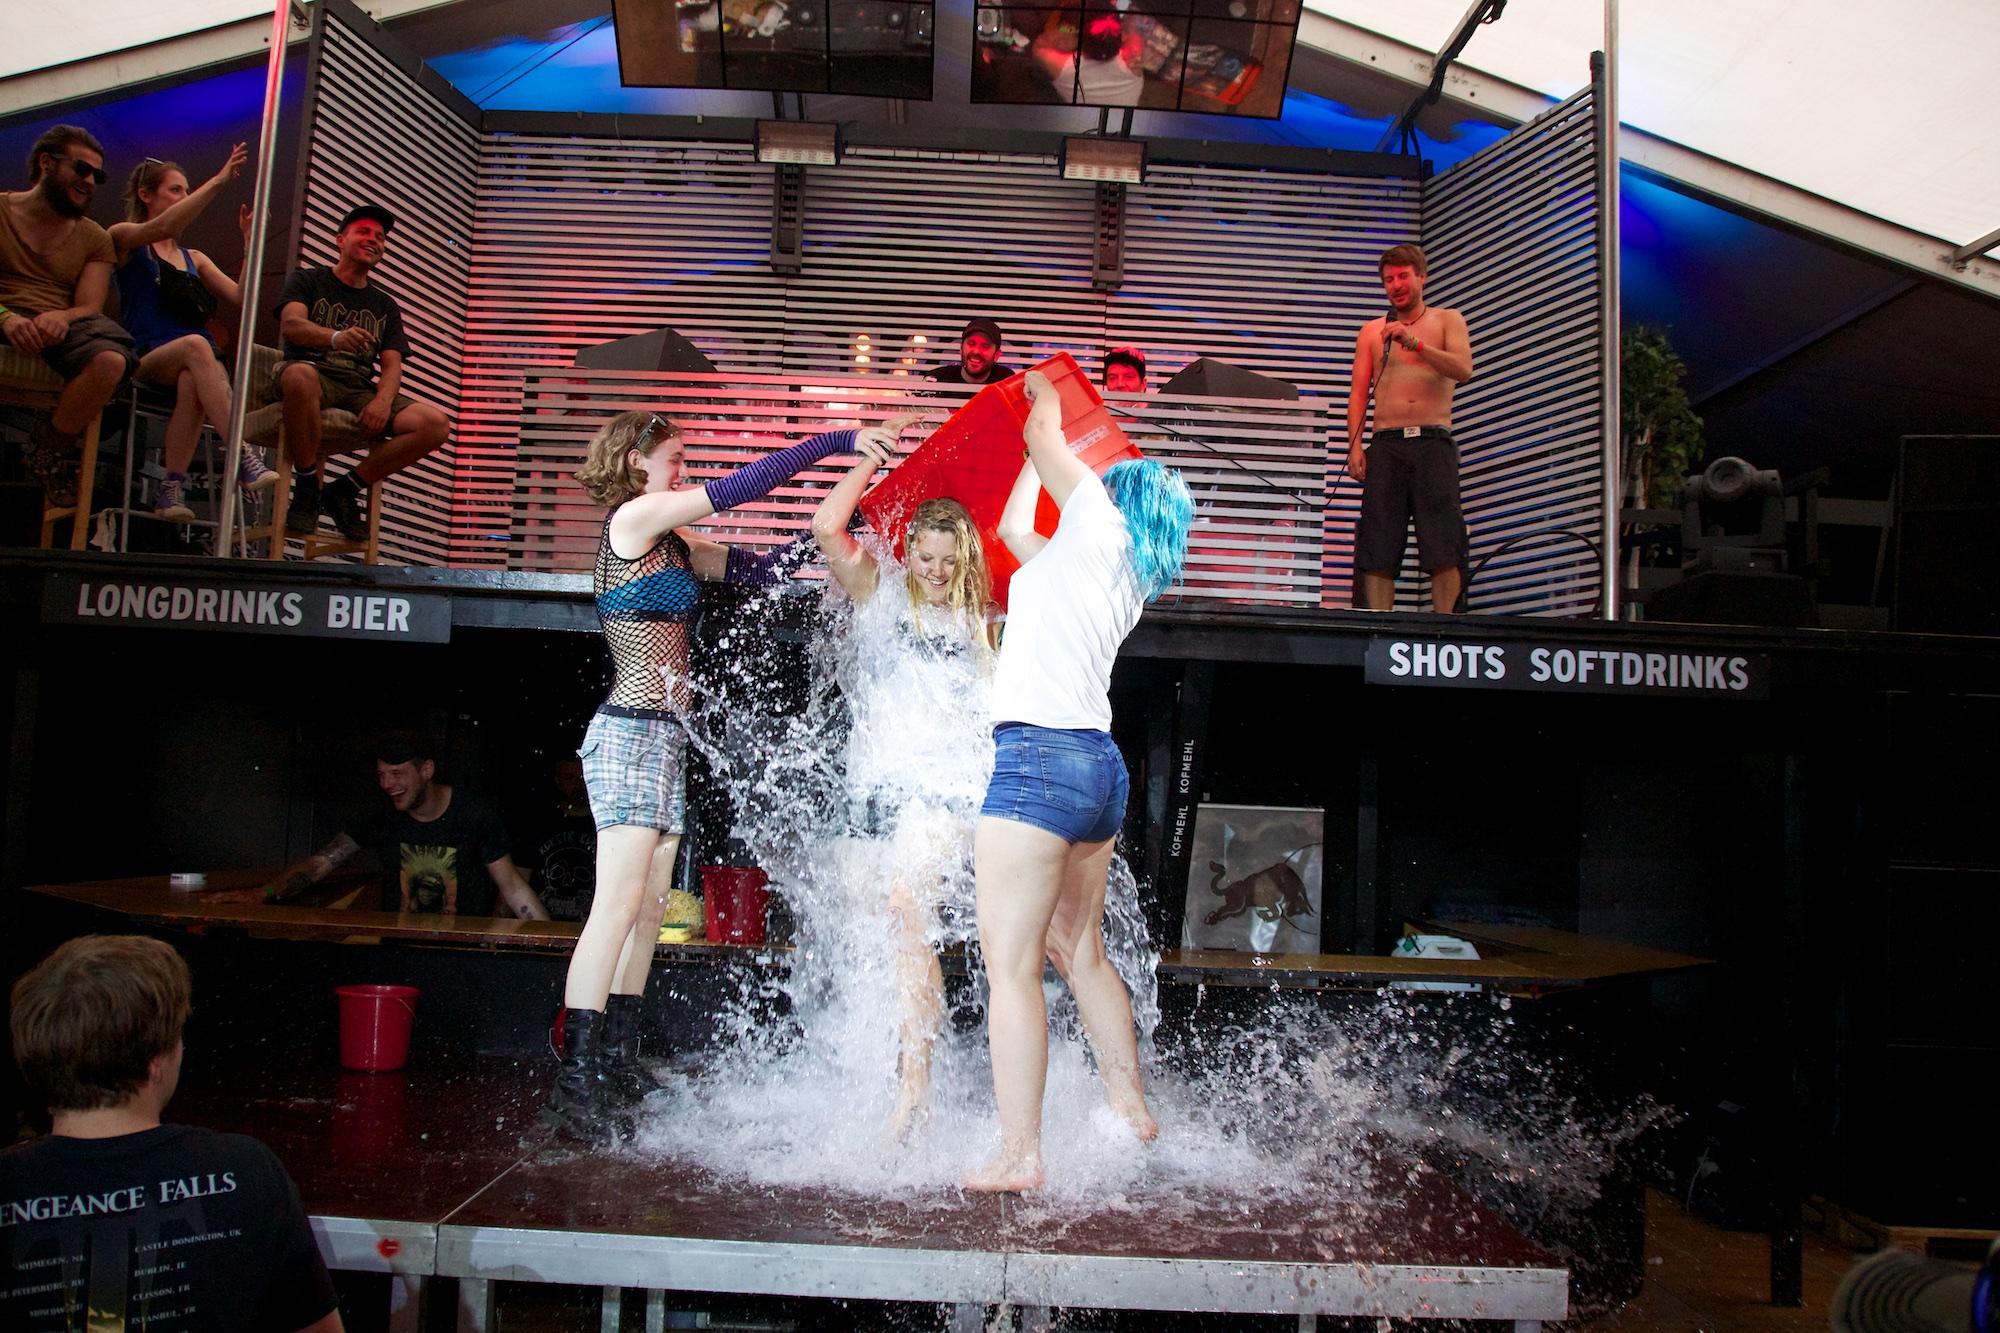 2015-06-13_GF-Wet-Tshirt-Contest3-SX_034